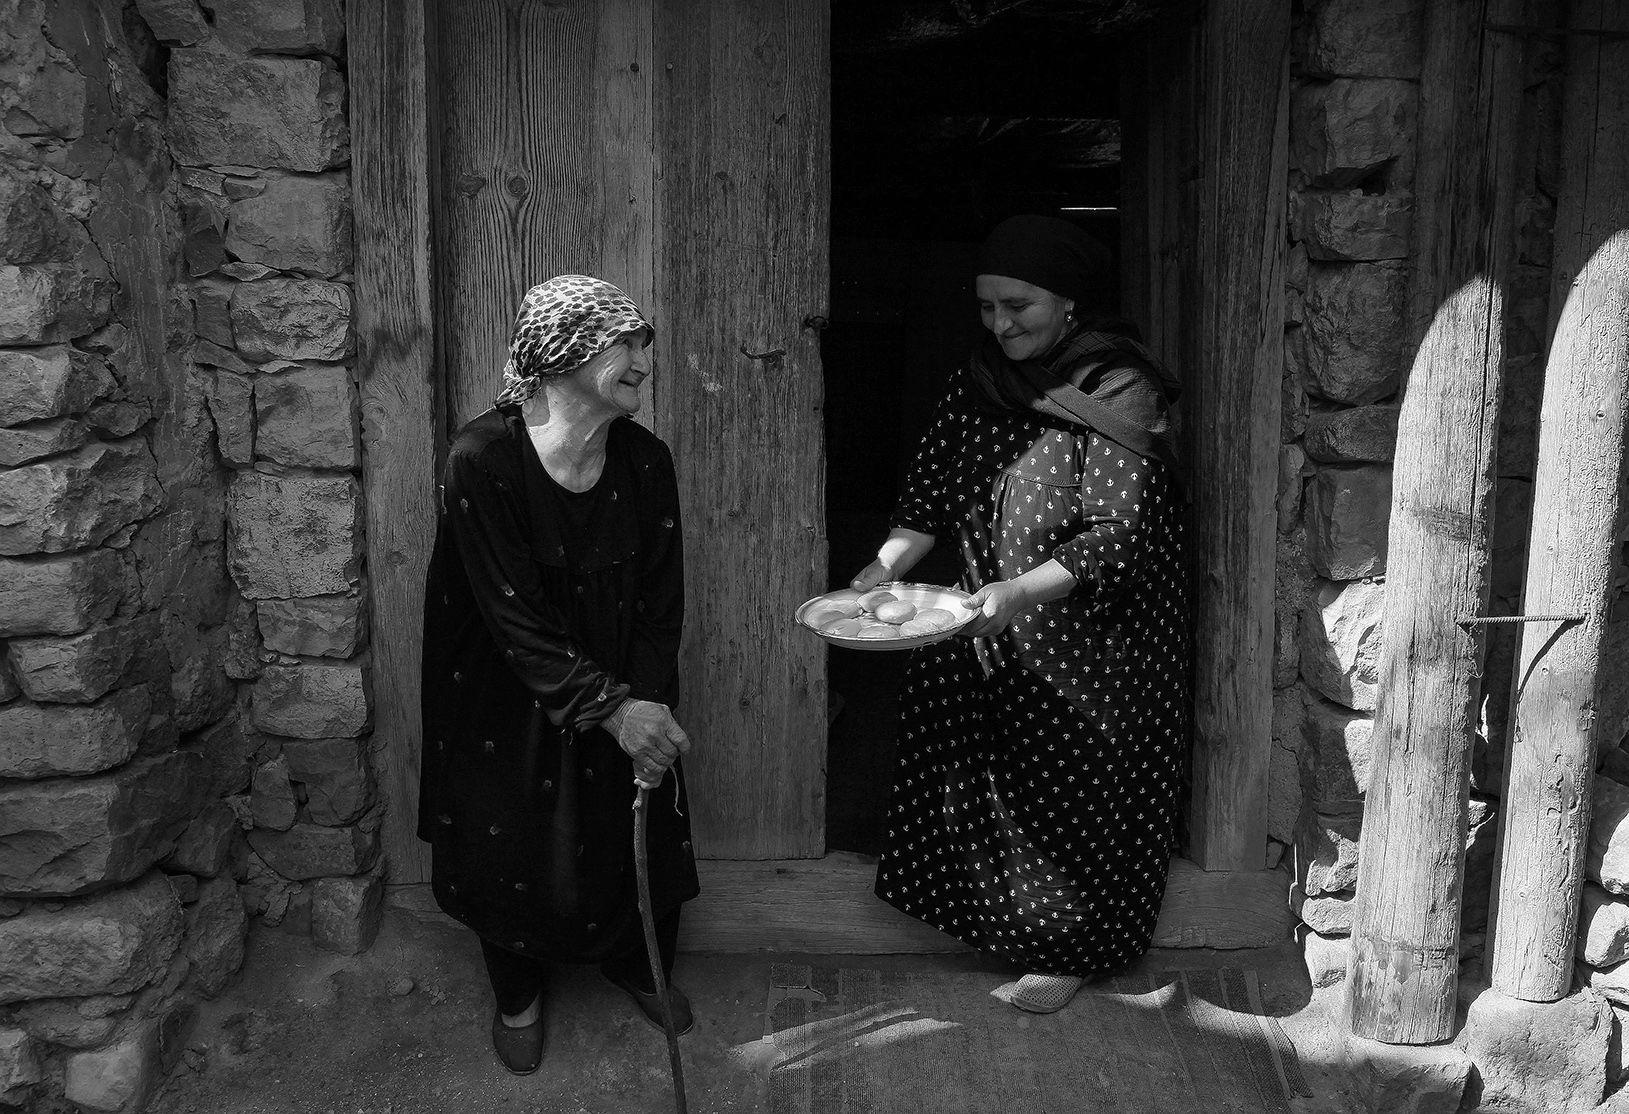 аул,бабушка,люди,село,дагестан,тлох,ботлихский район,, Magov Marat